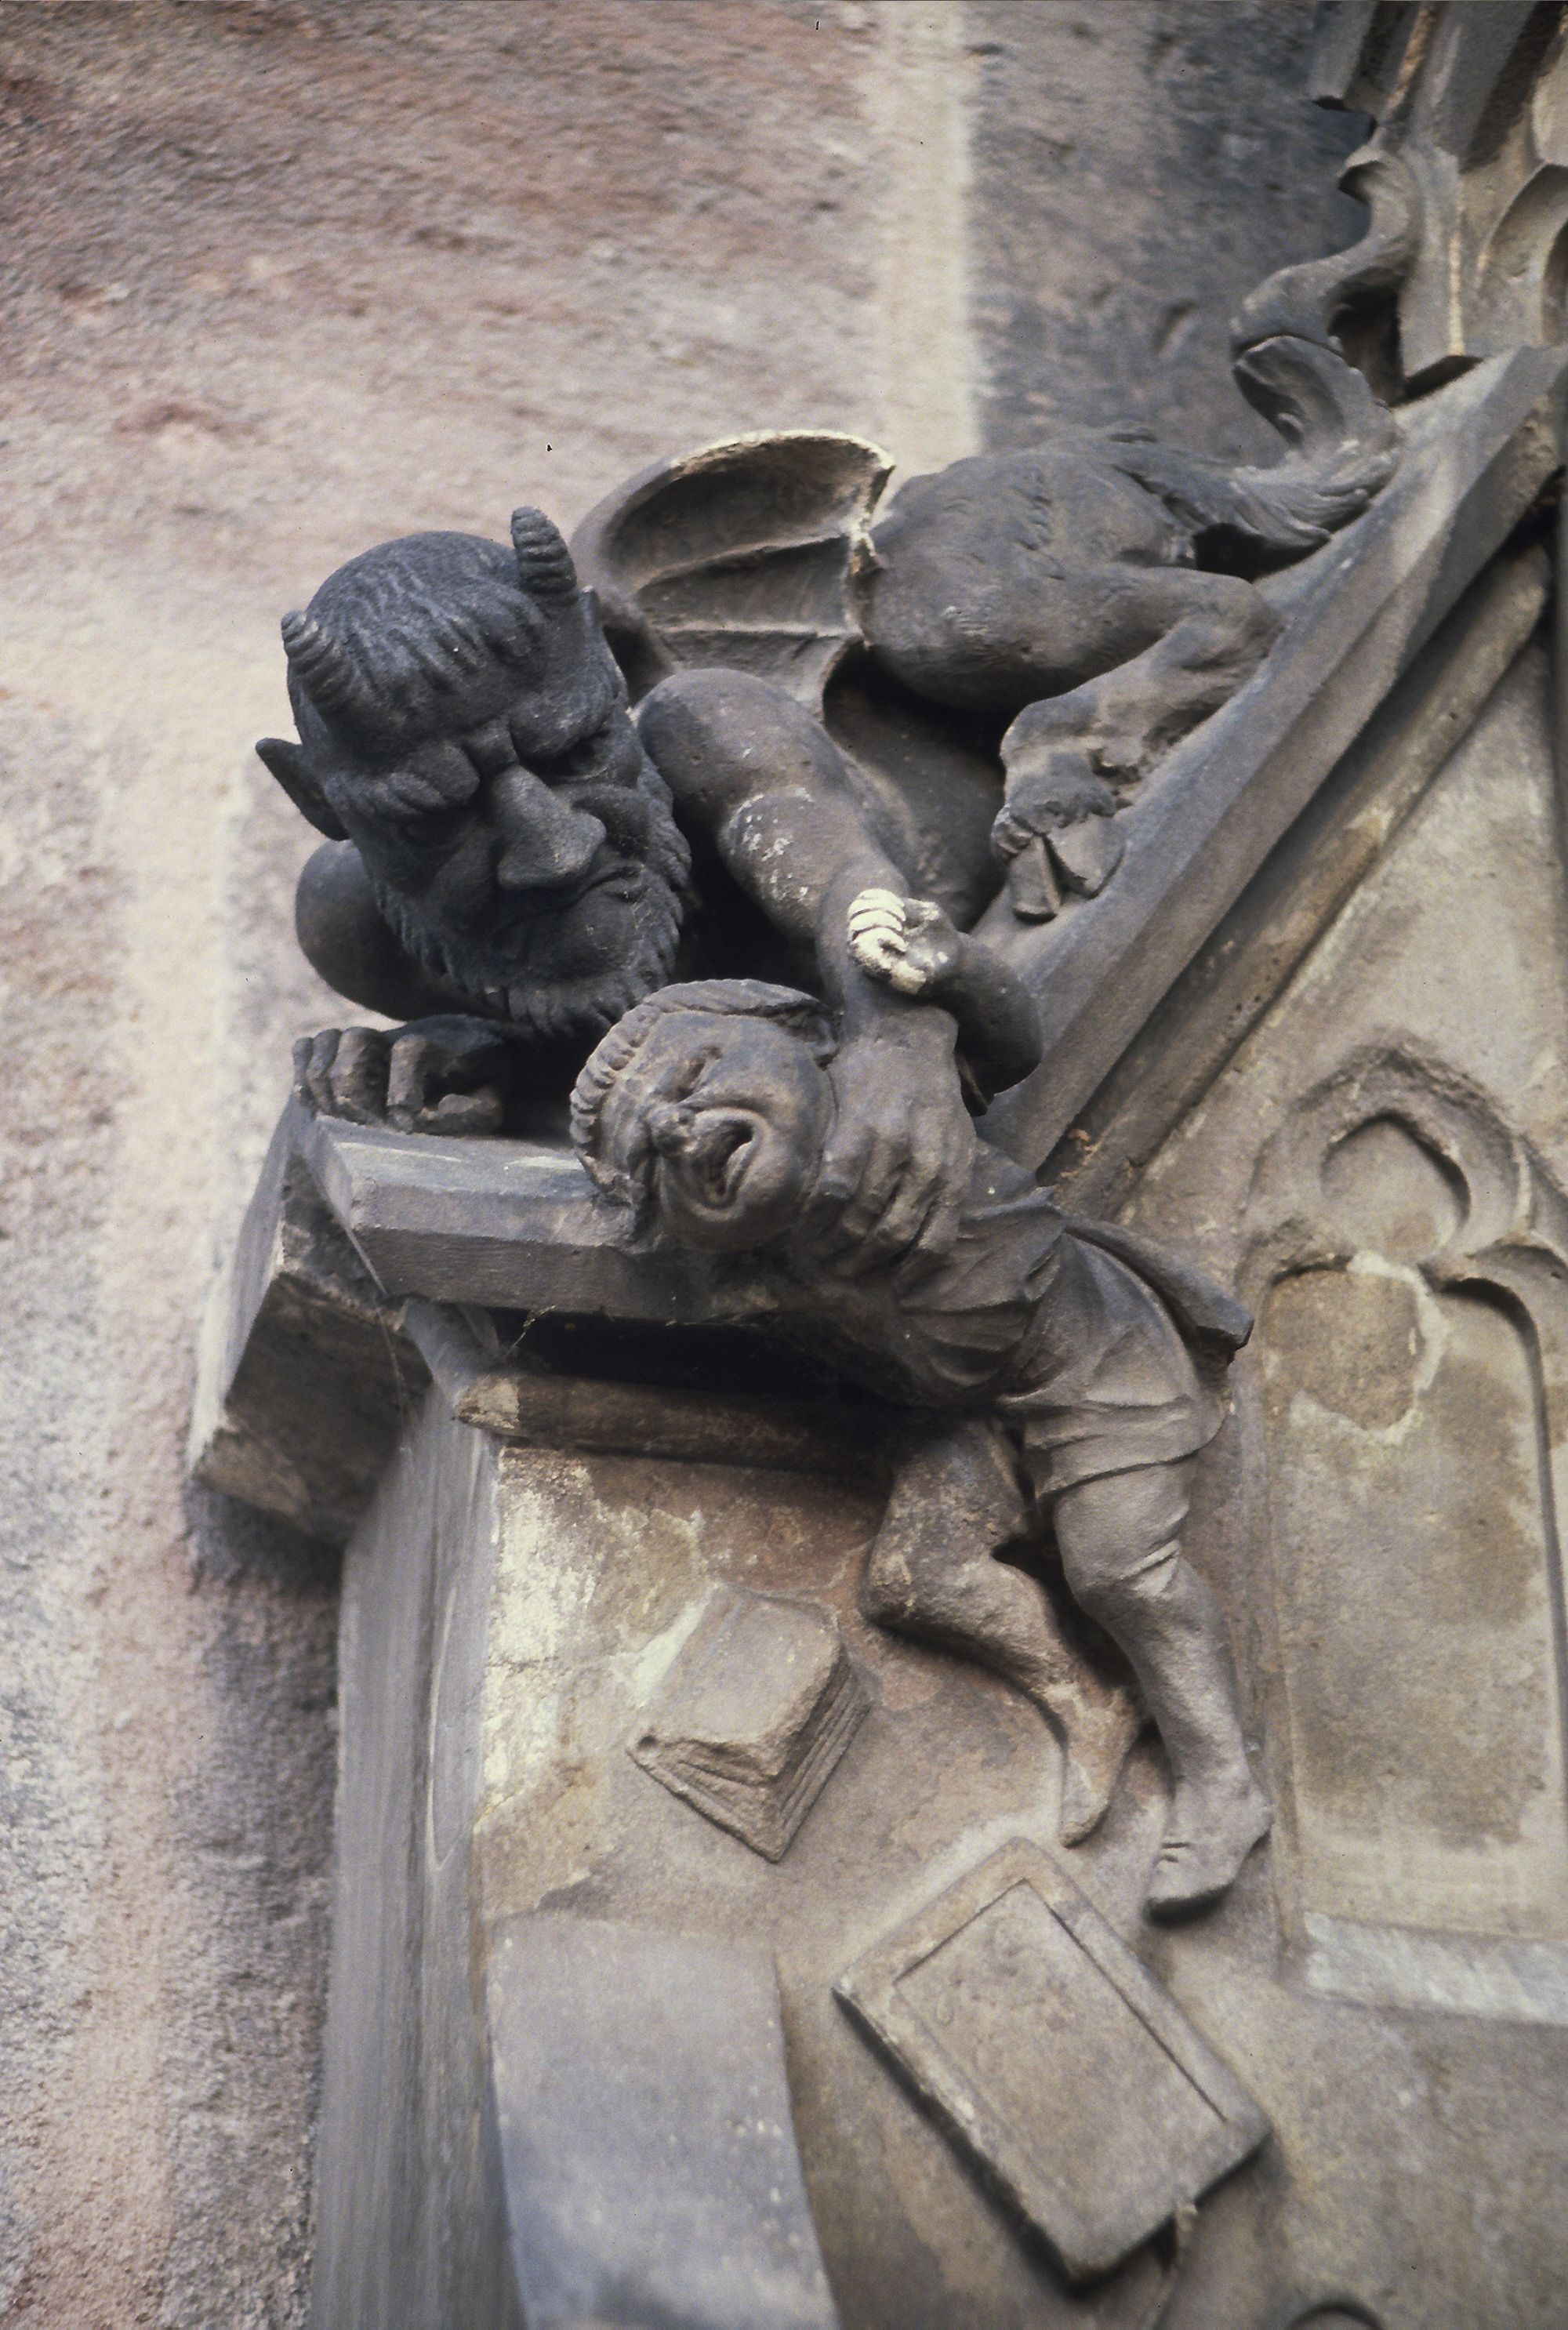 demon grabbinbg child